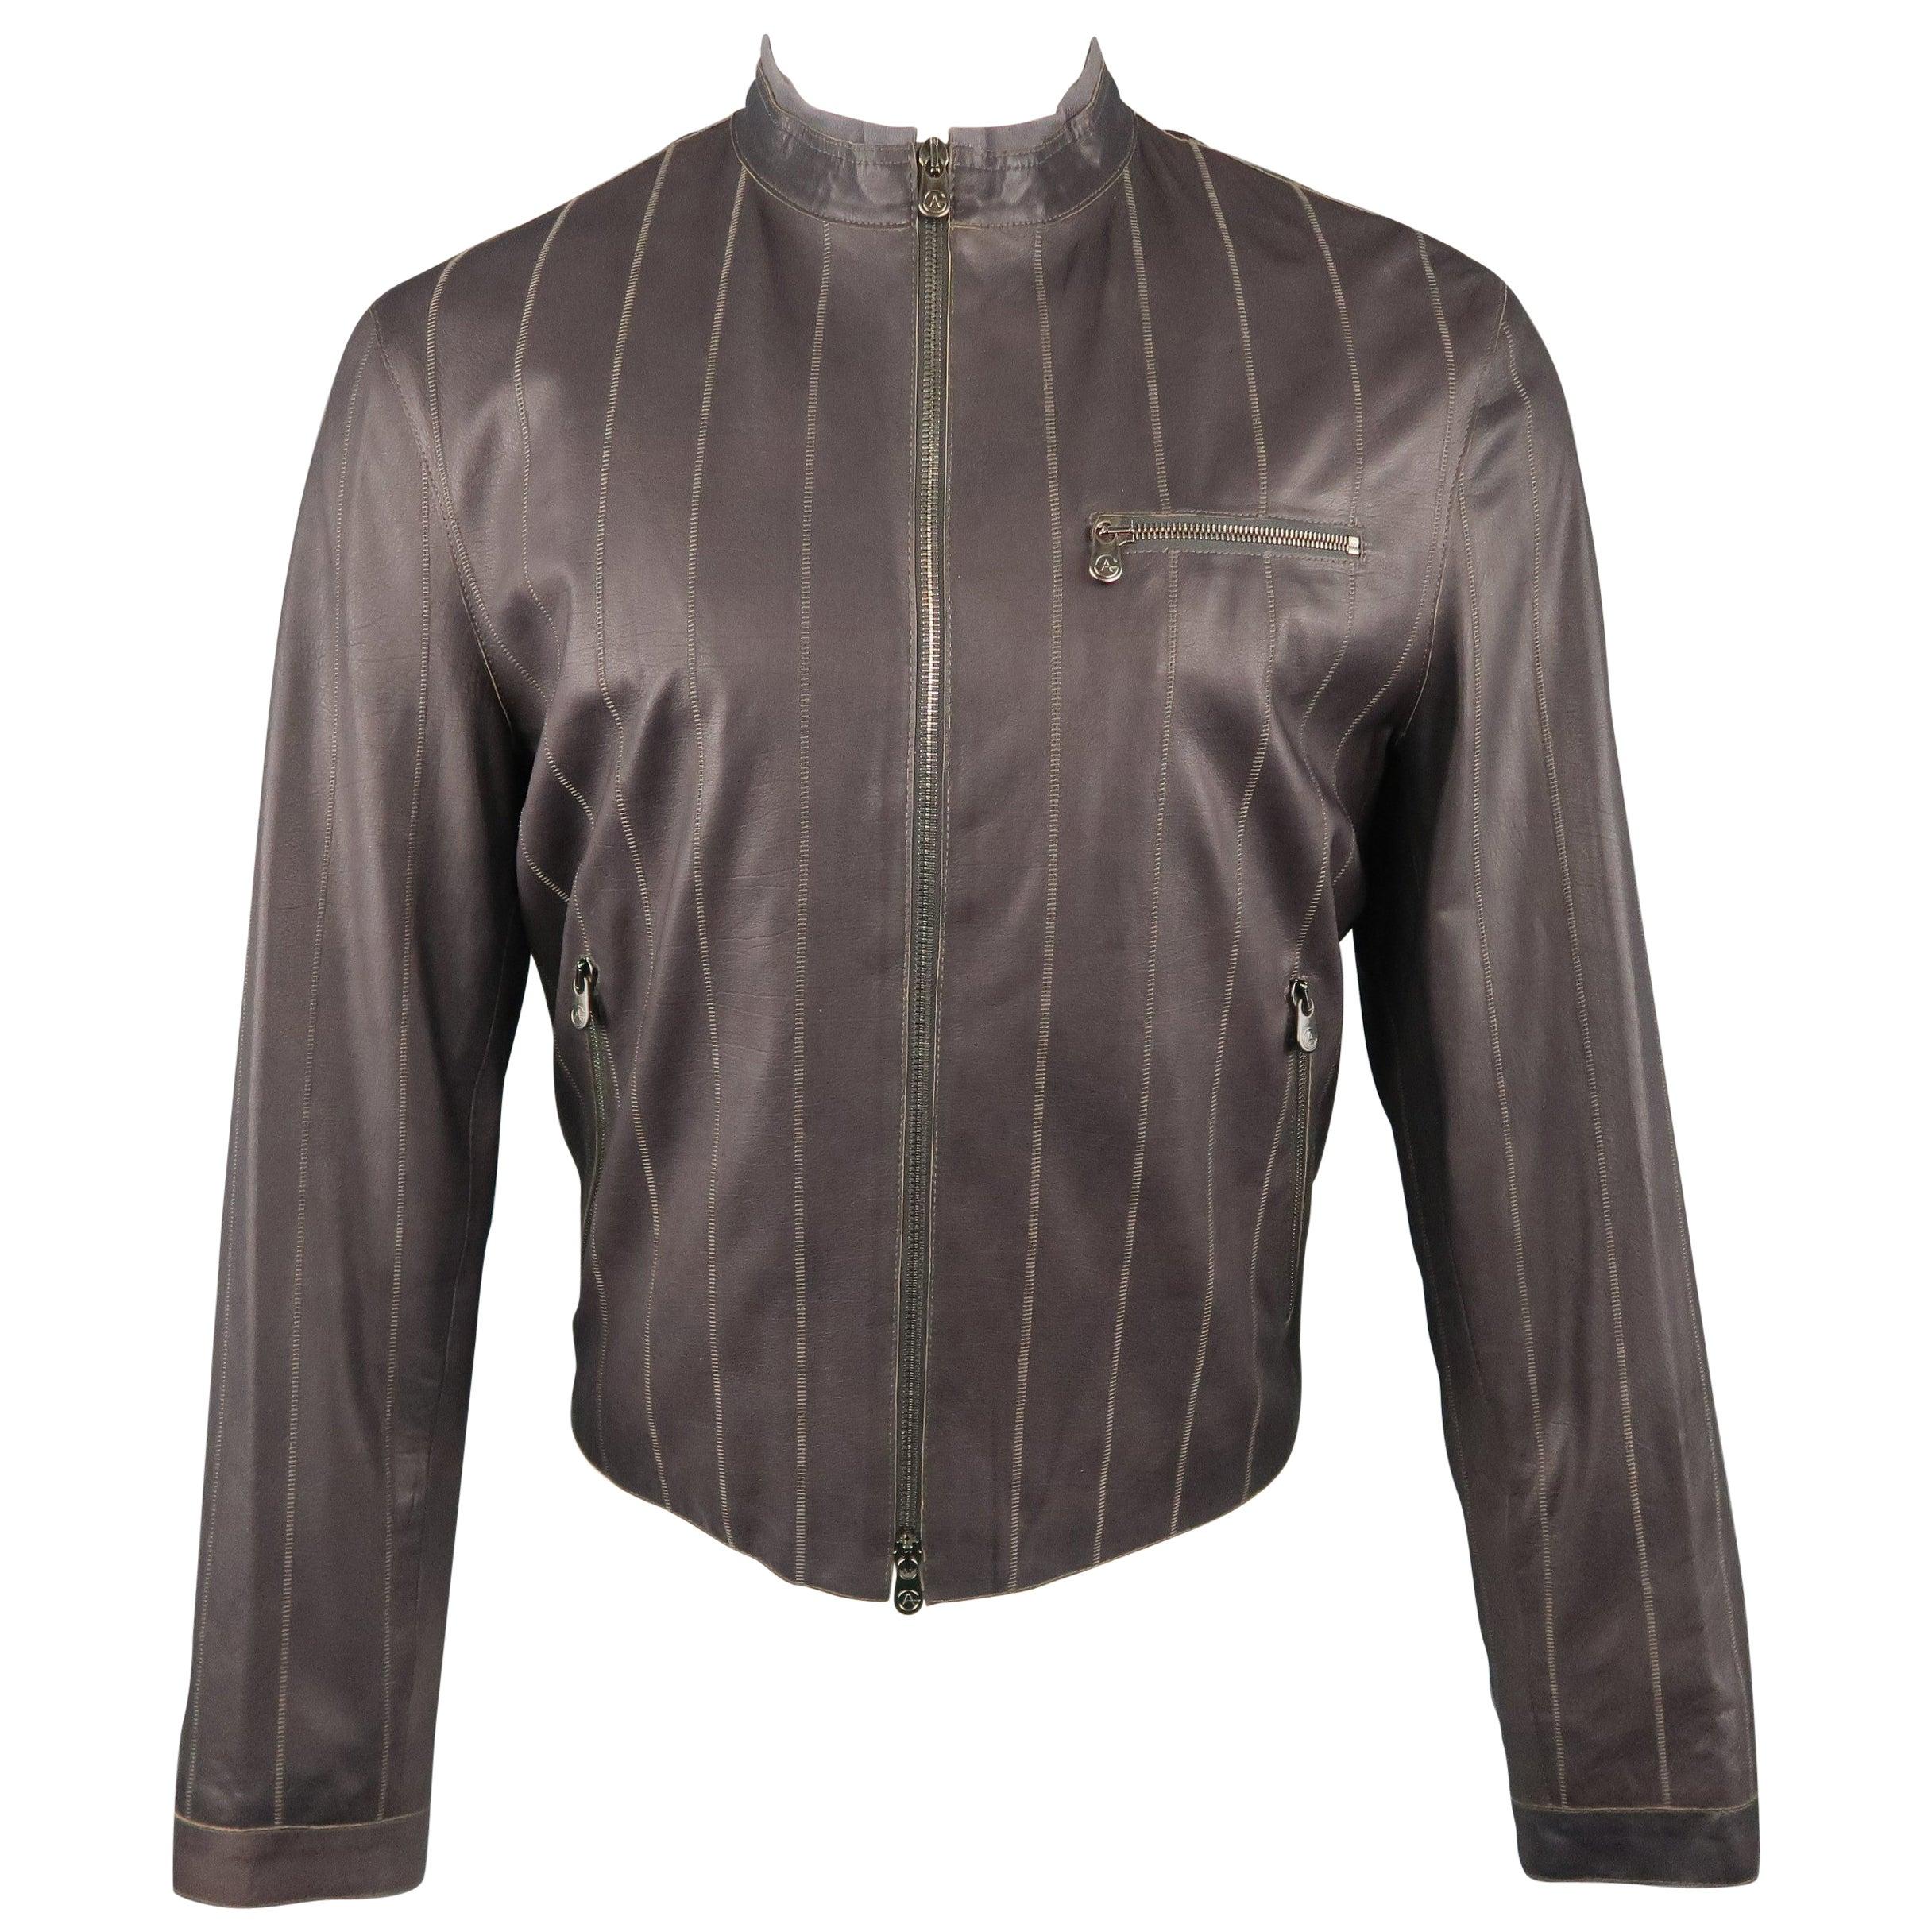 Men's ARMANI COLLEZIONI 40 Purple Stitched Leather Biker Jacket